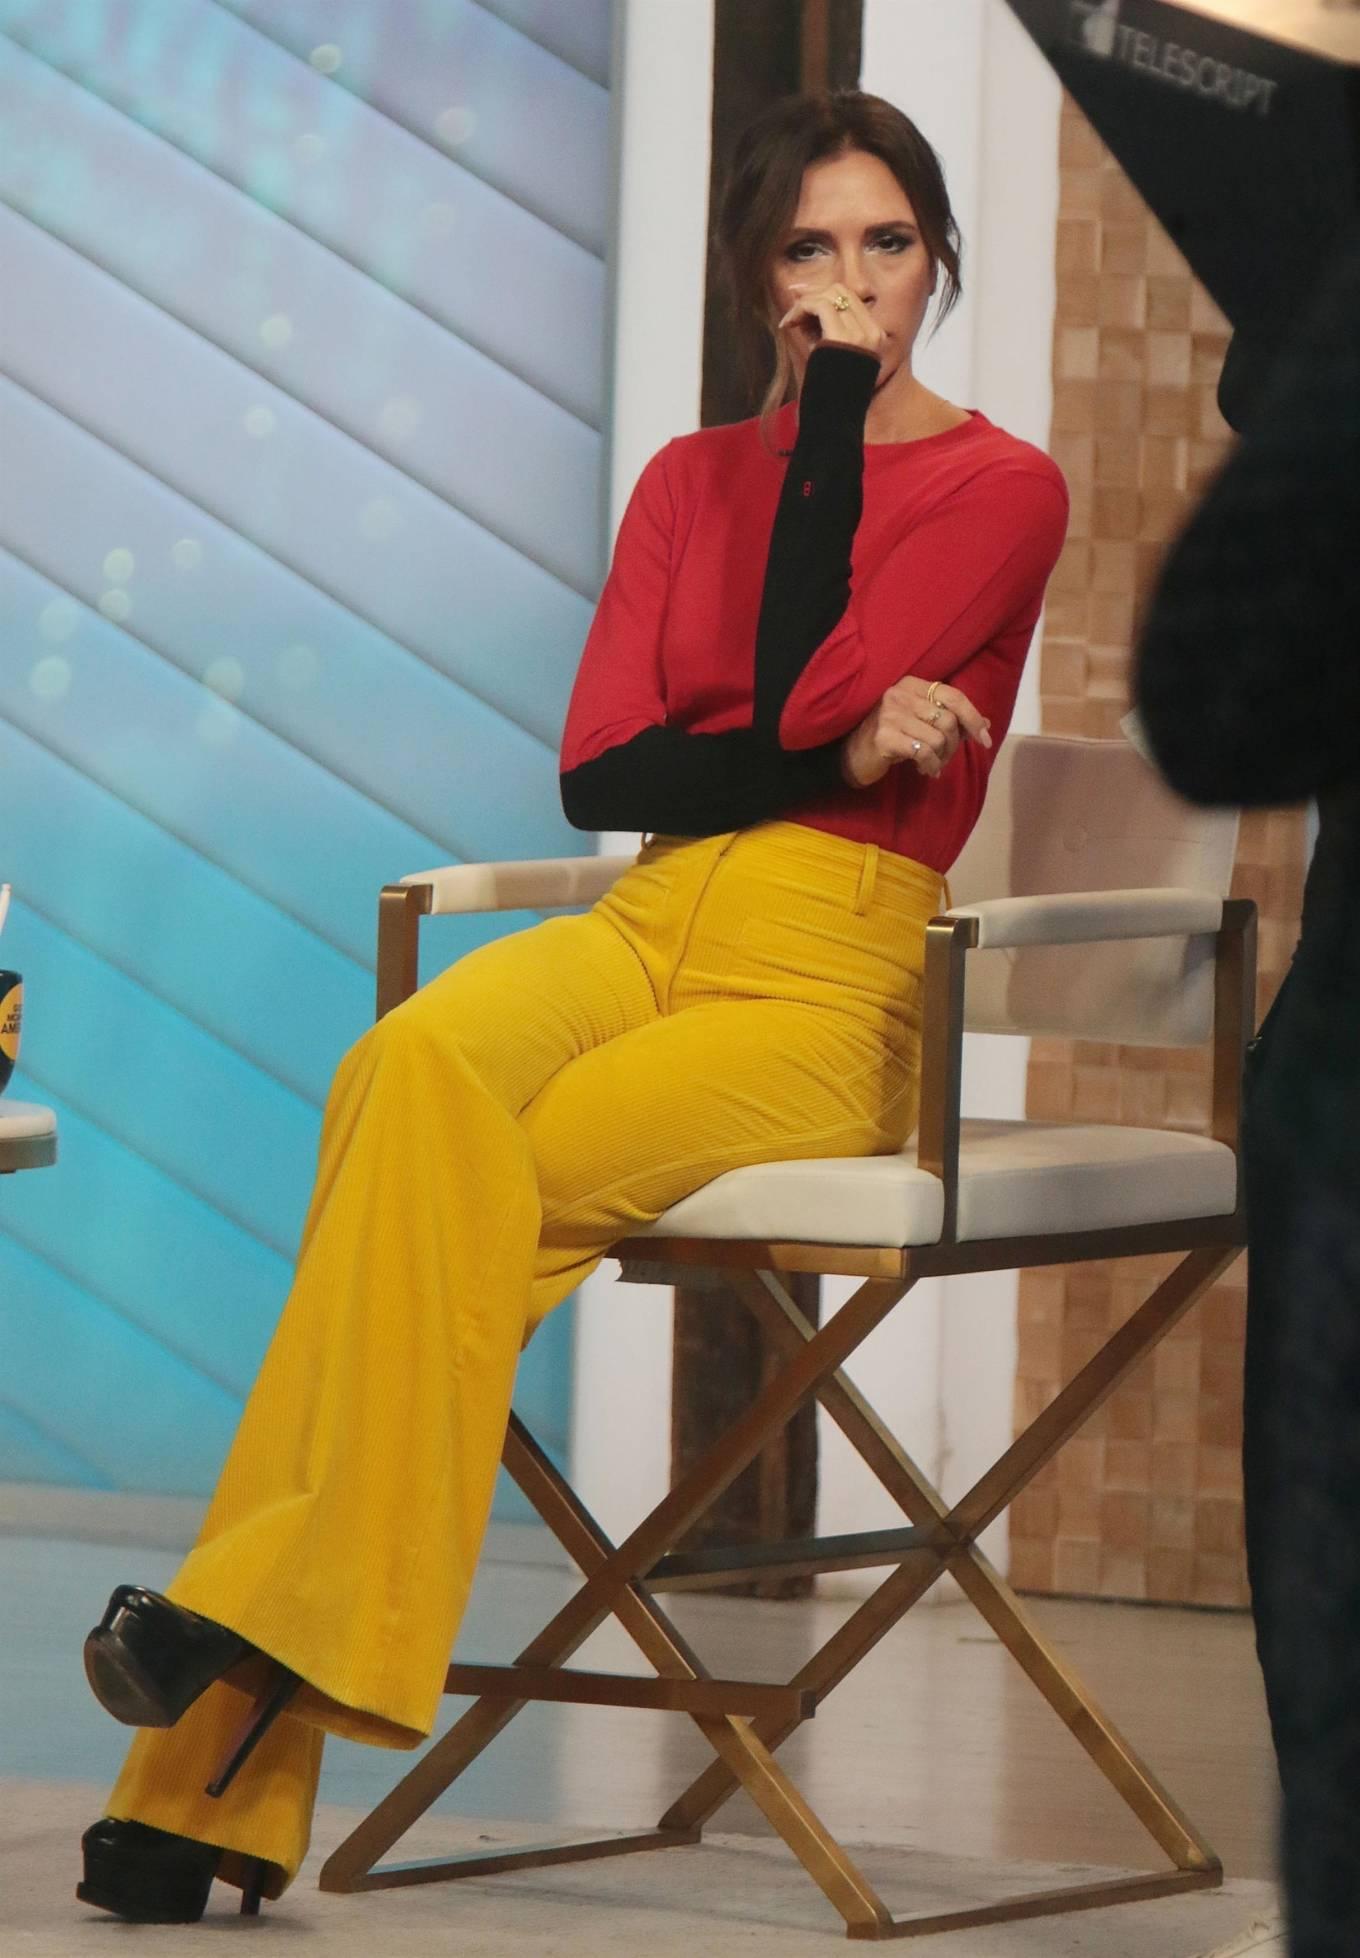 Victoria Beckham 2021 : Victoria Beckham – on Good Morning America promoting her new designer clothing in New York City-34